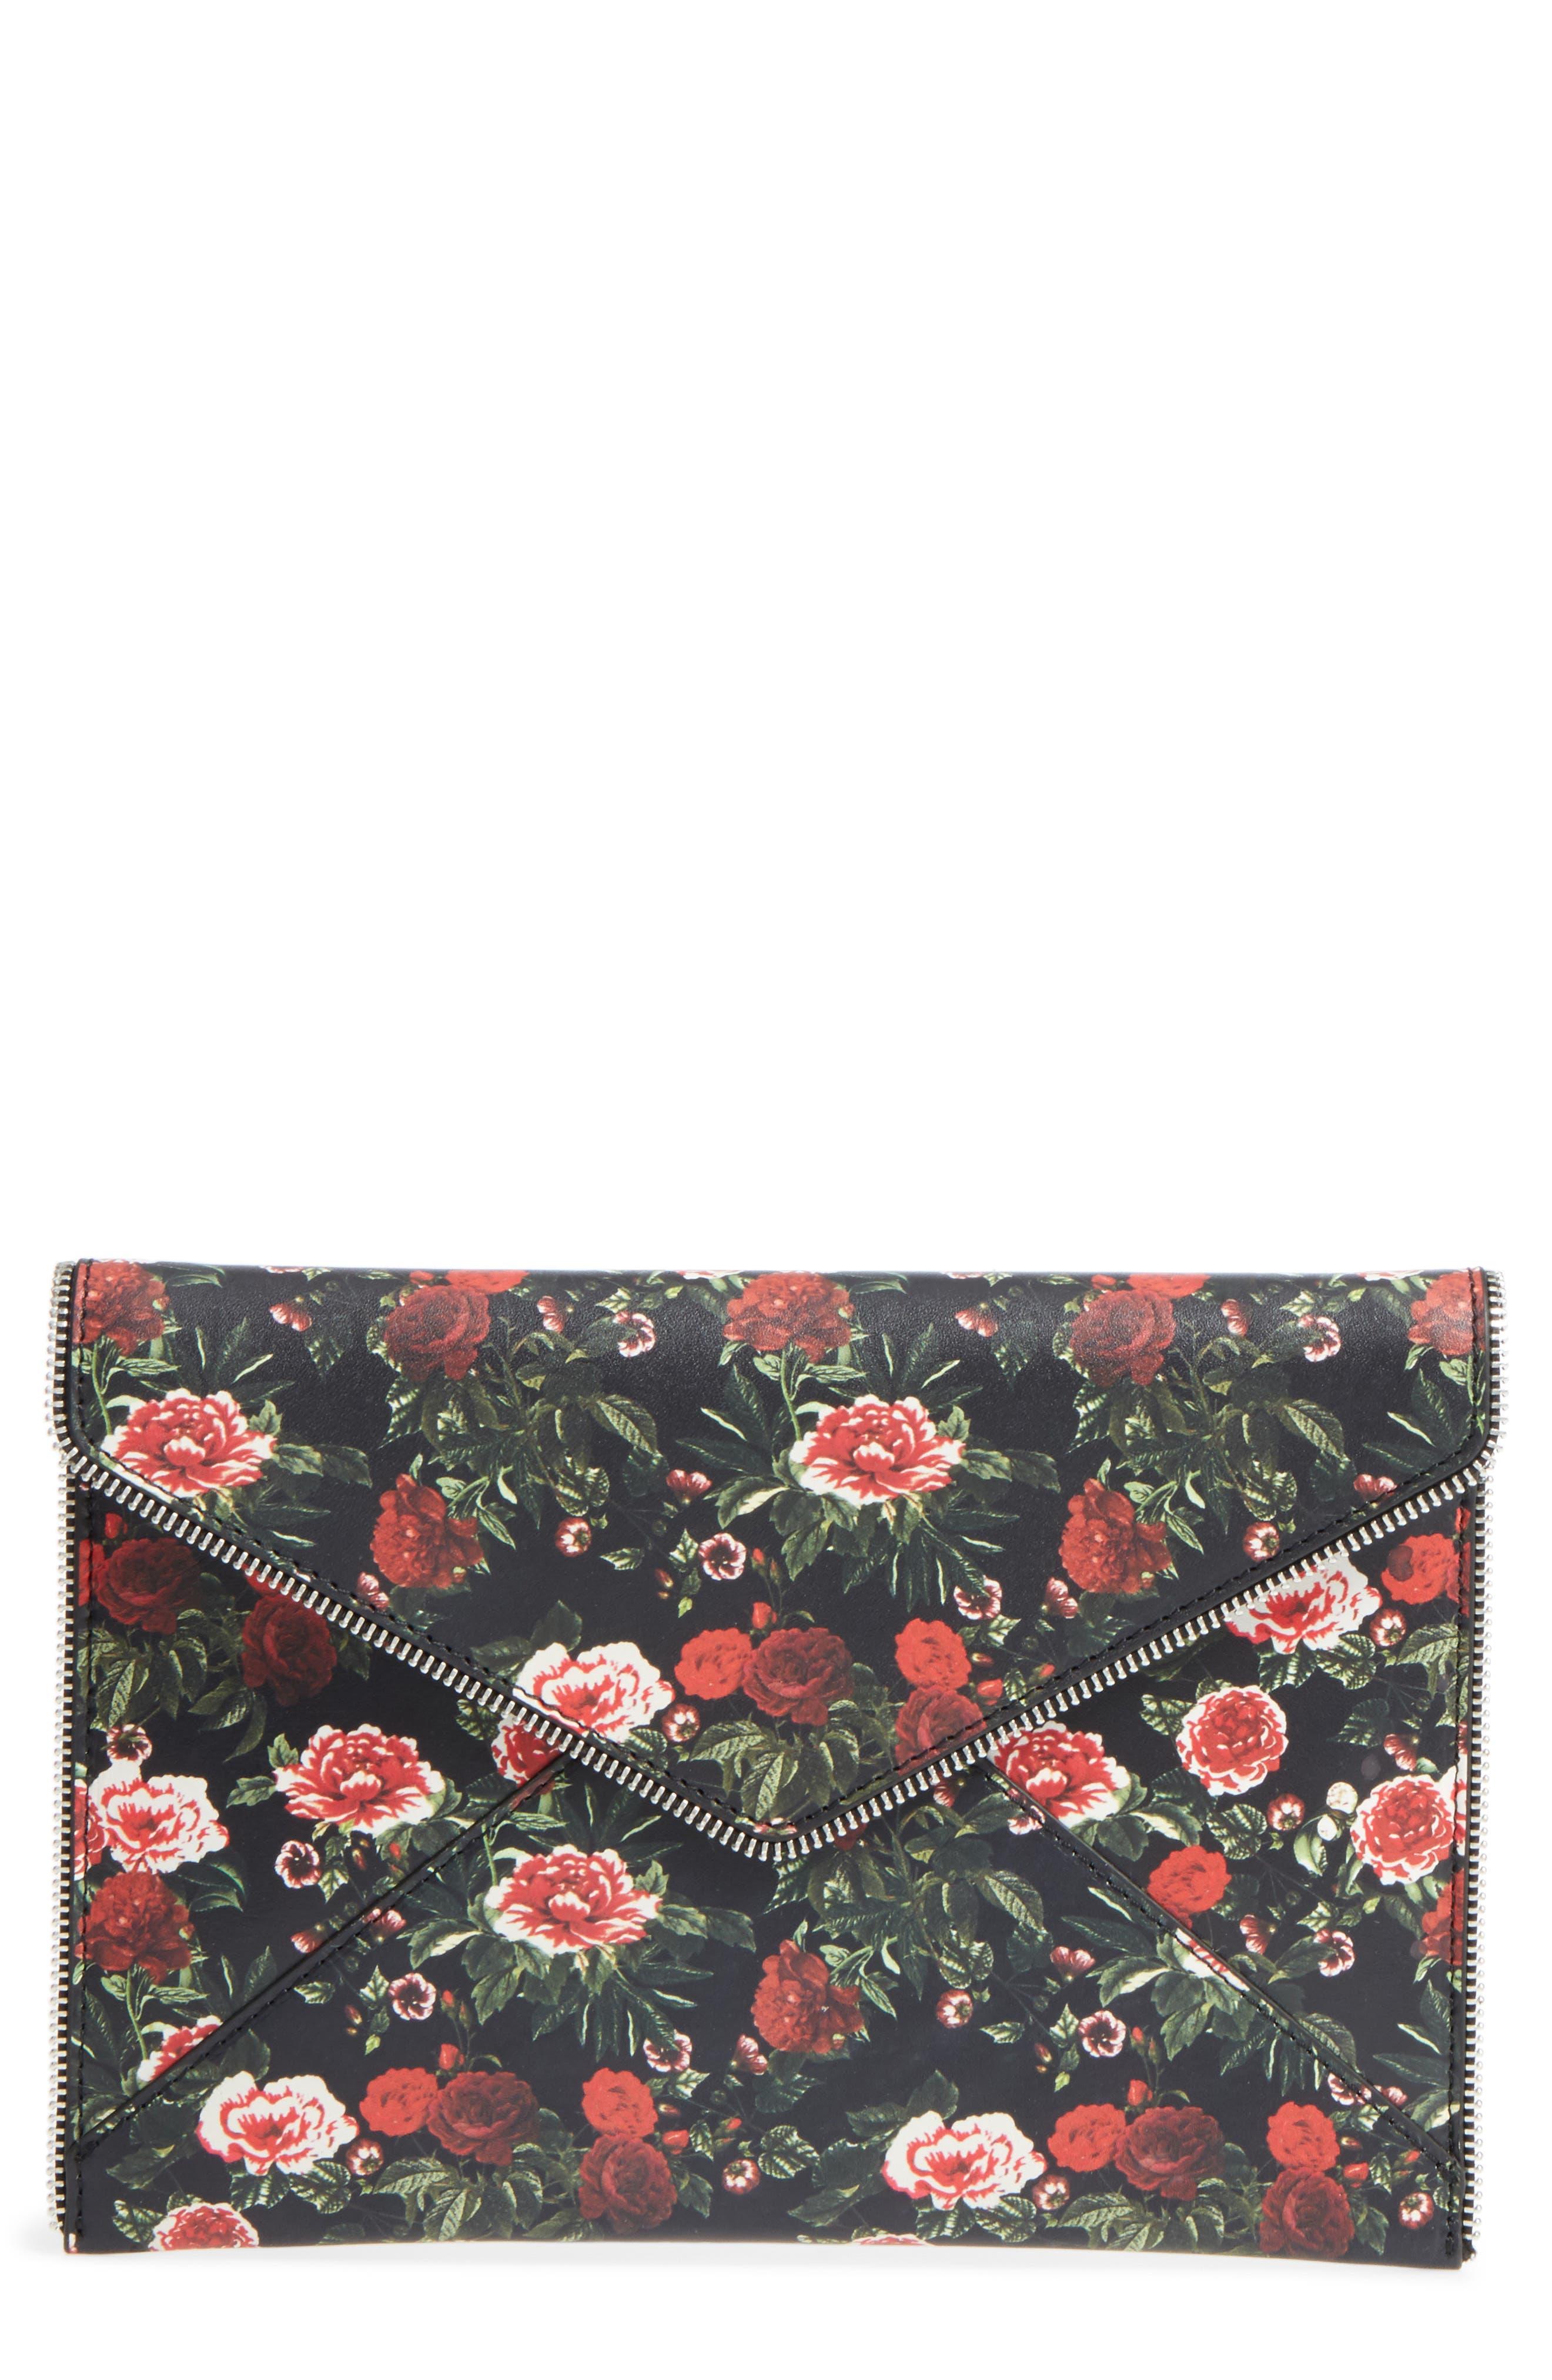 Rebecca Minkoff Floral Print Leather Leo Clutch